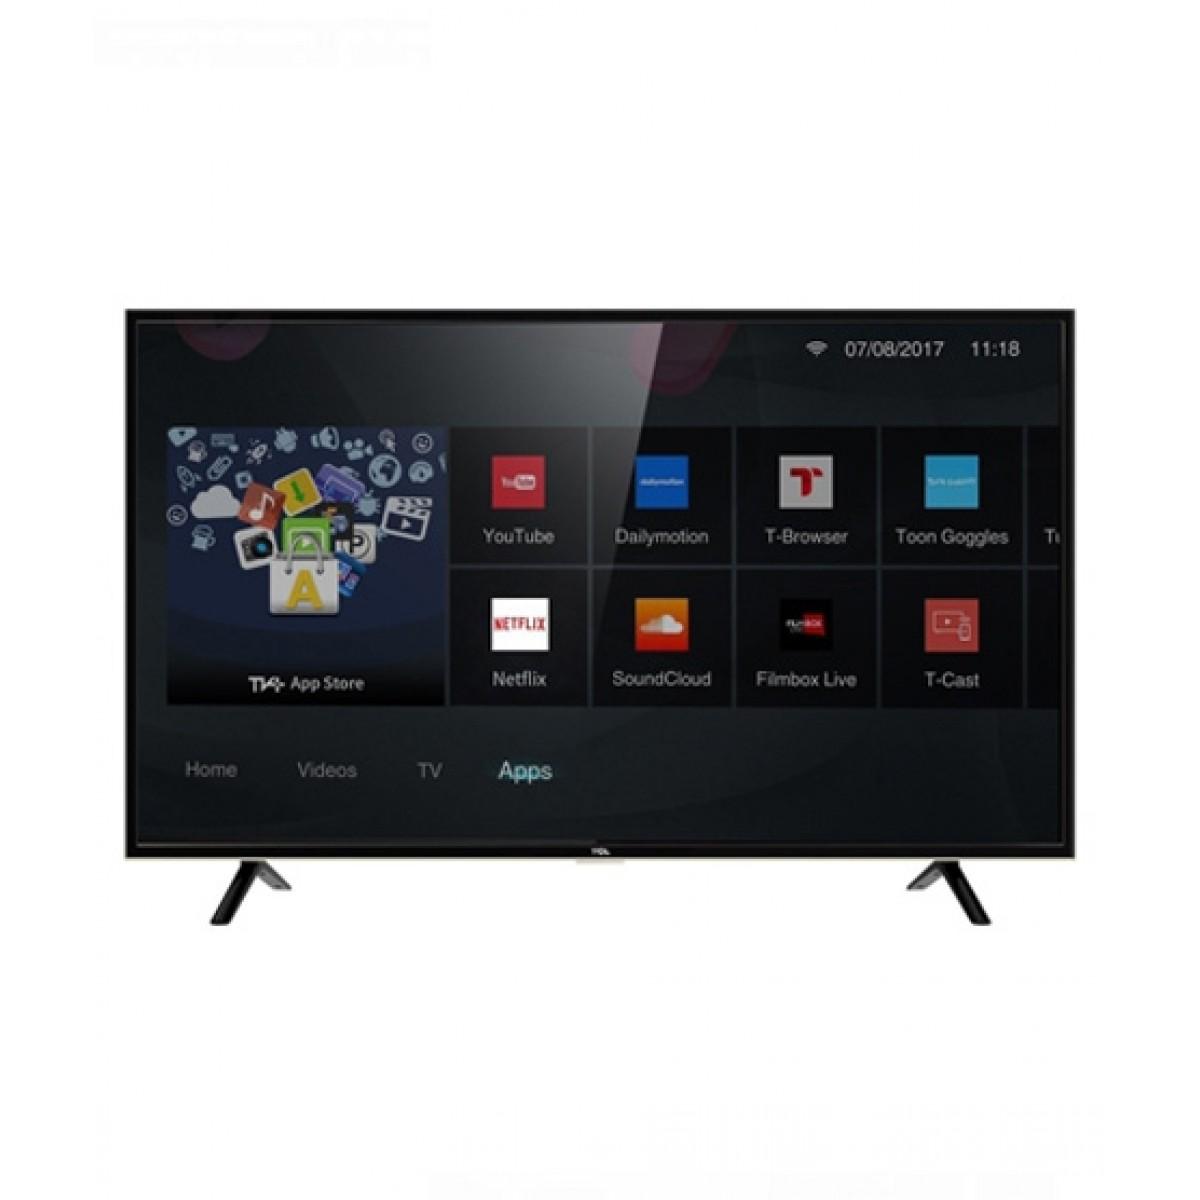 Tcl 55 Full Hd Smart Led Tv L55s62 Price In Pakistan Buy Tcl 55 Full Hd Smart Led Tv L55s62 Ishopping Pk